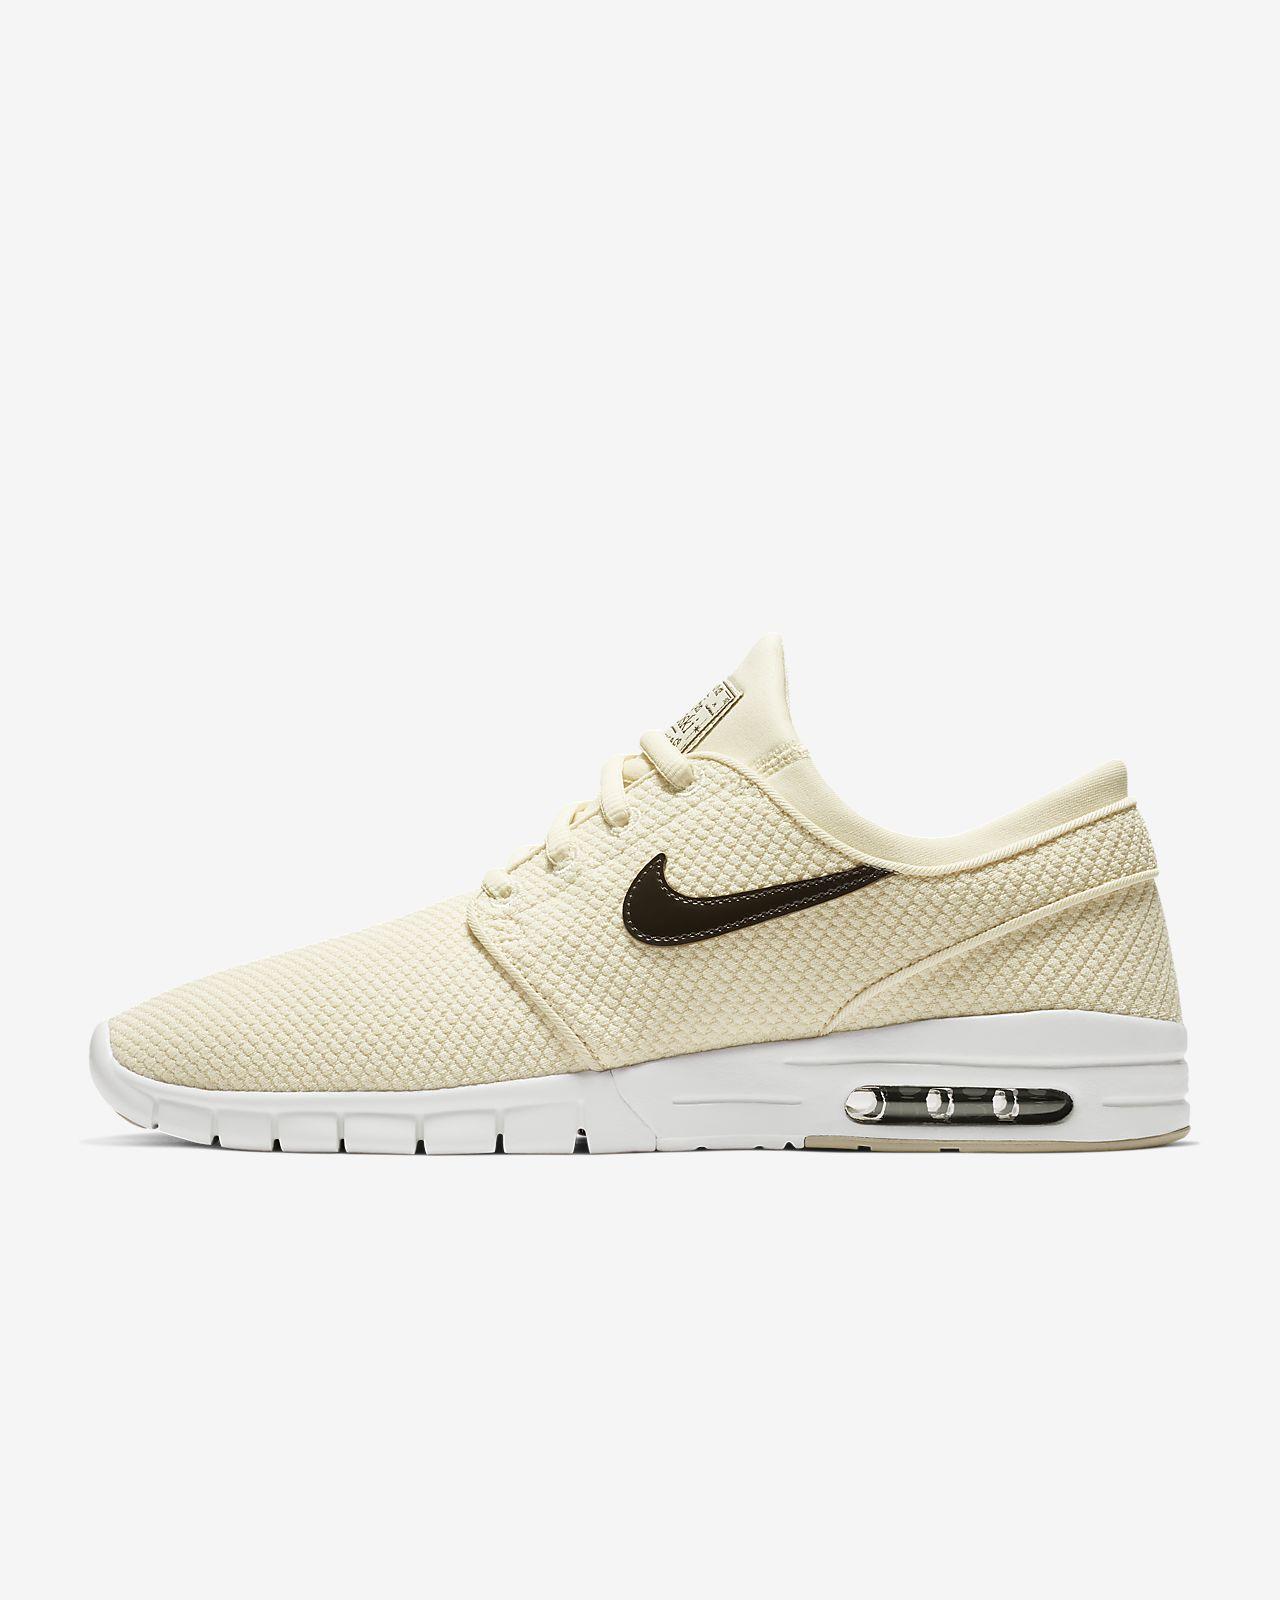 new product ecc6f 1d72e ... Skatesko Nike SB Stefan Janoski Max